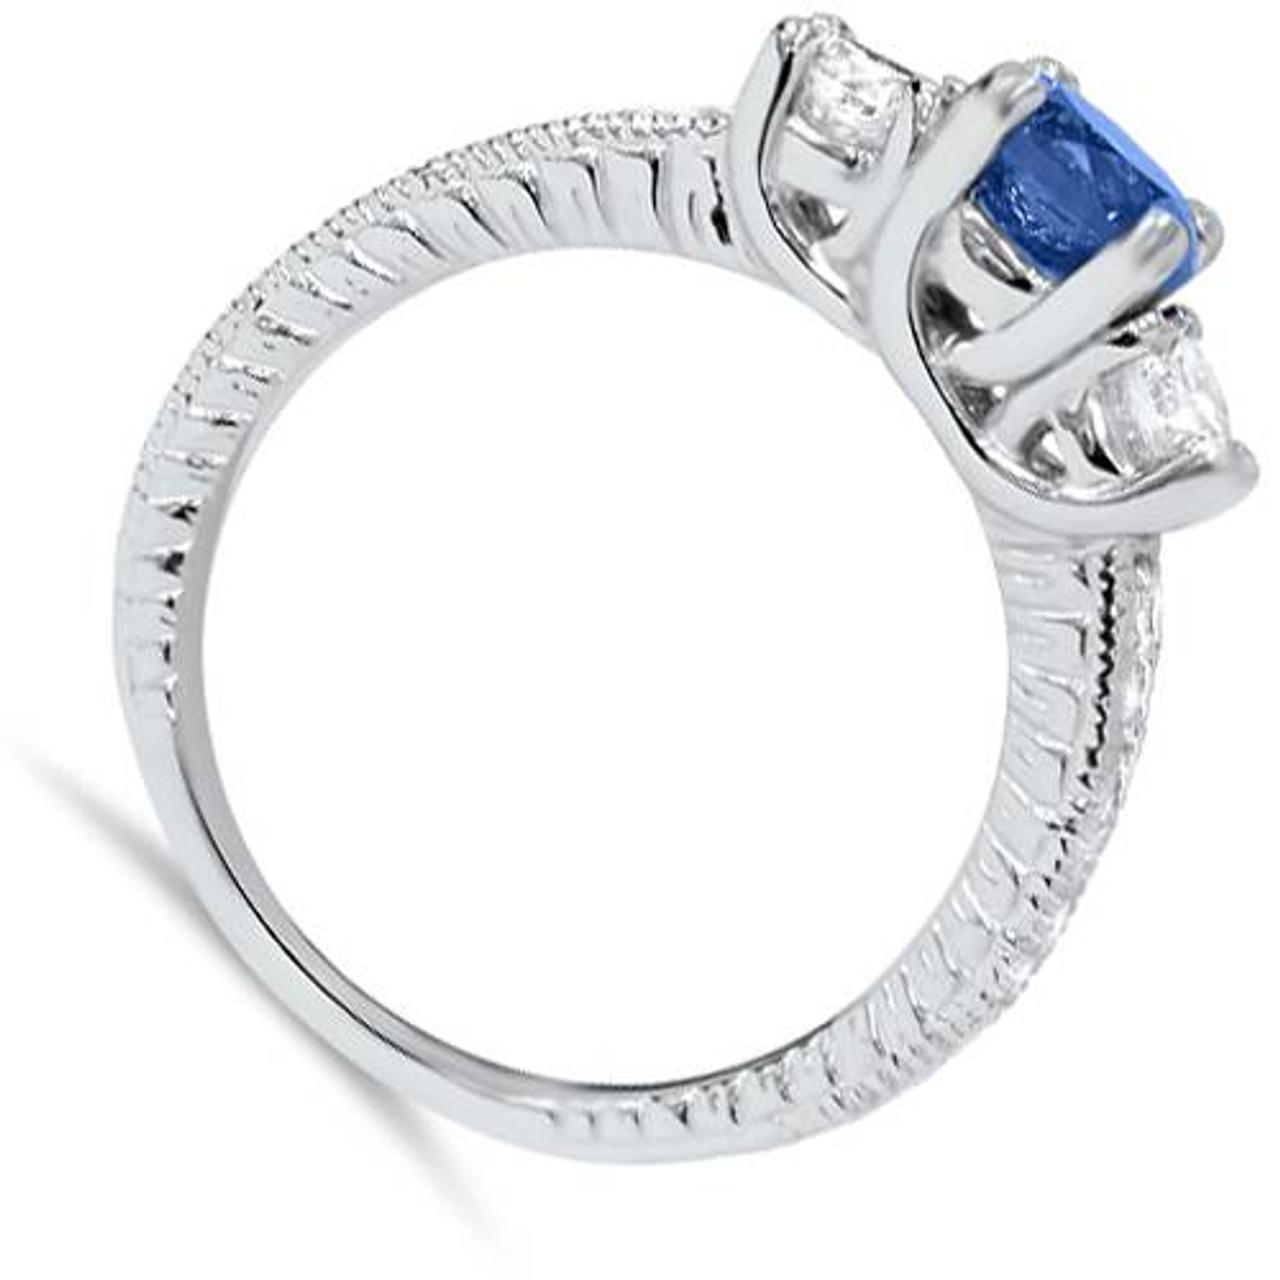 ef795bcbbf2d 1ct Vintage Blue Diamond 3-Stone Engagement Ring 14K White Gold